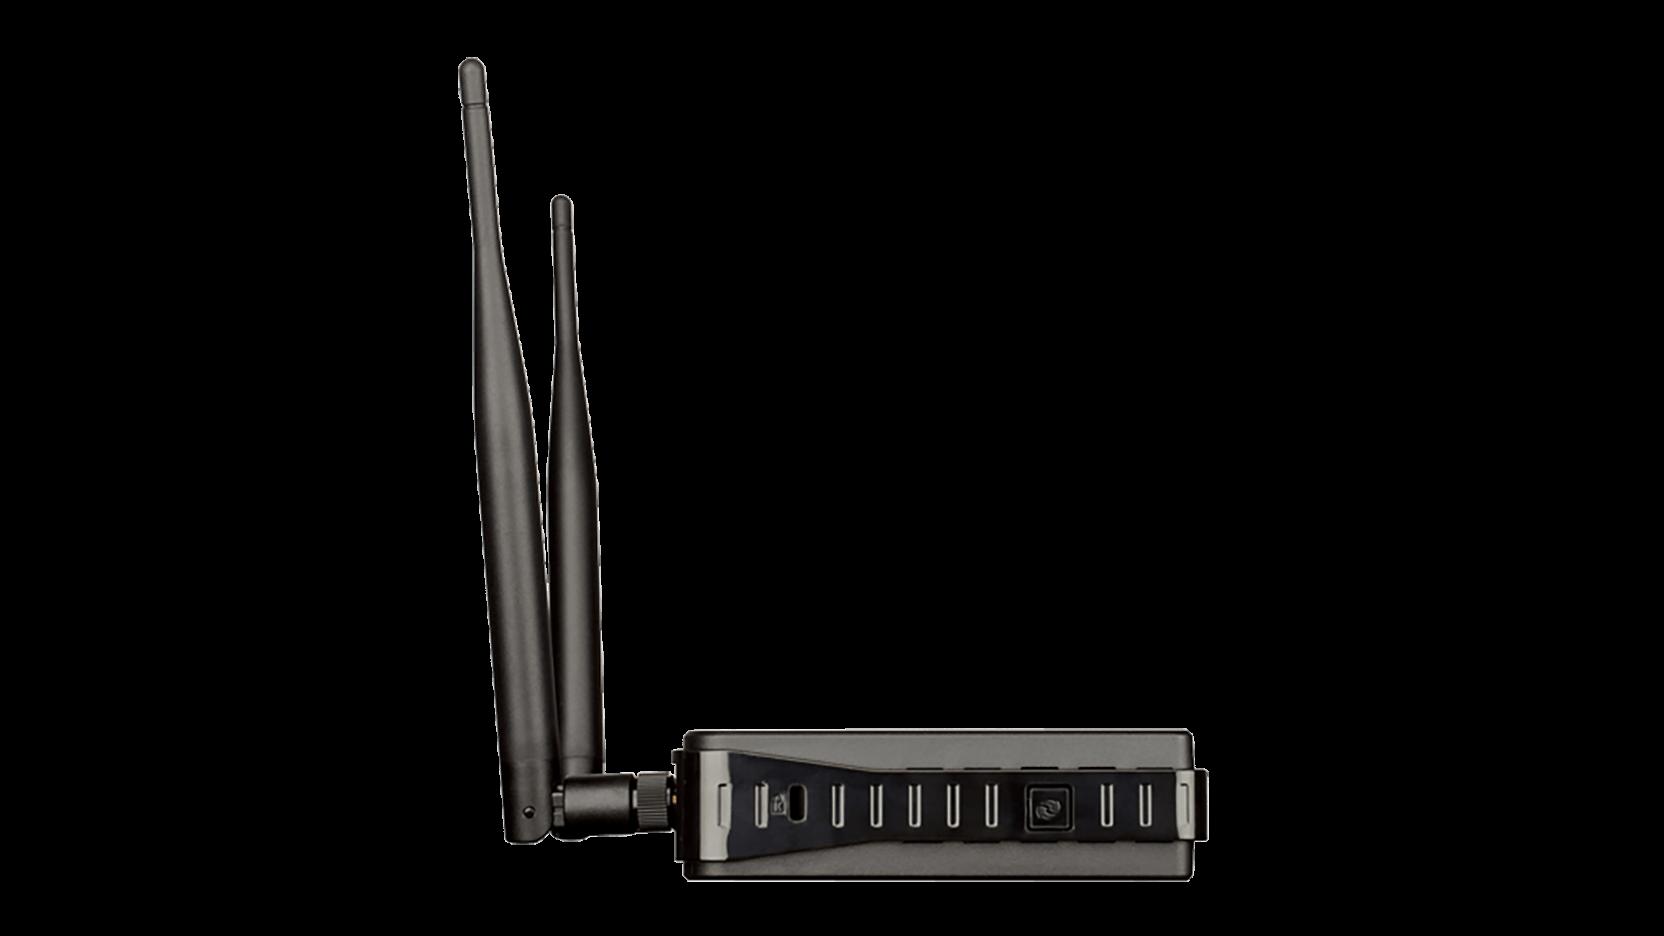 D-Link DAP-1360 revC Range Extender Driver Download